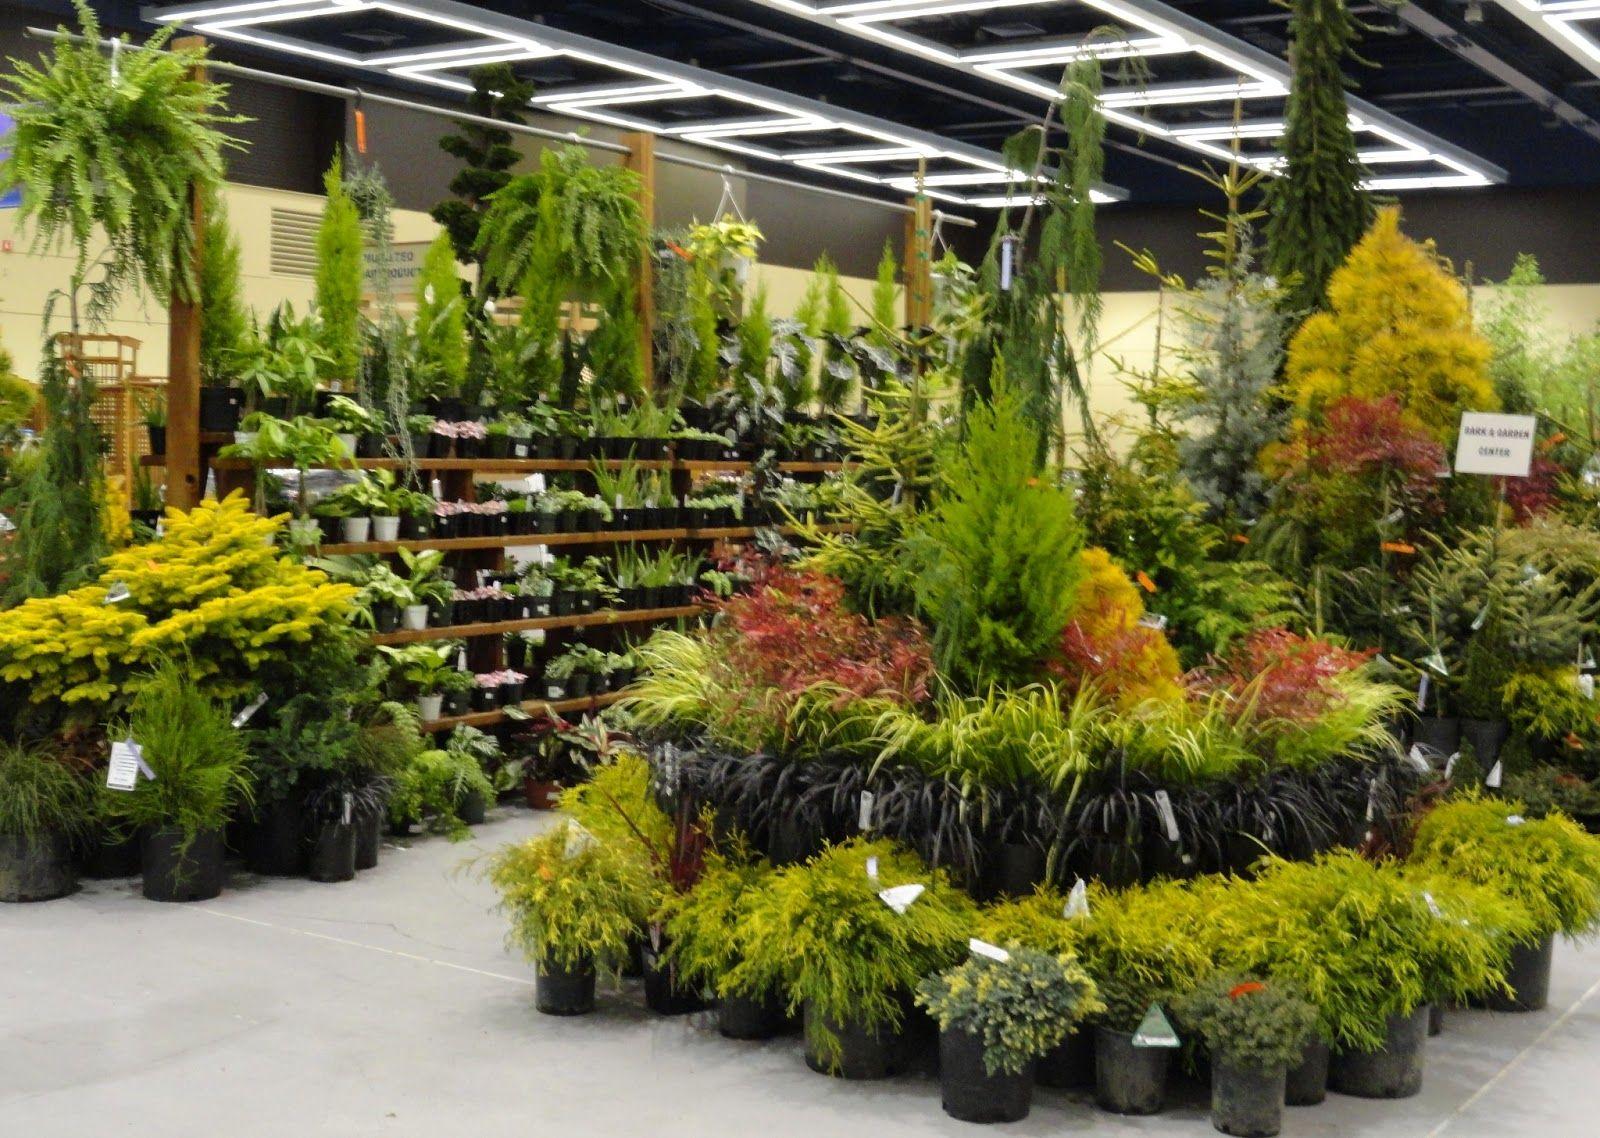 30 Best Images About Garden Center Displays On Pinterest Gardens